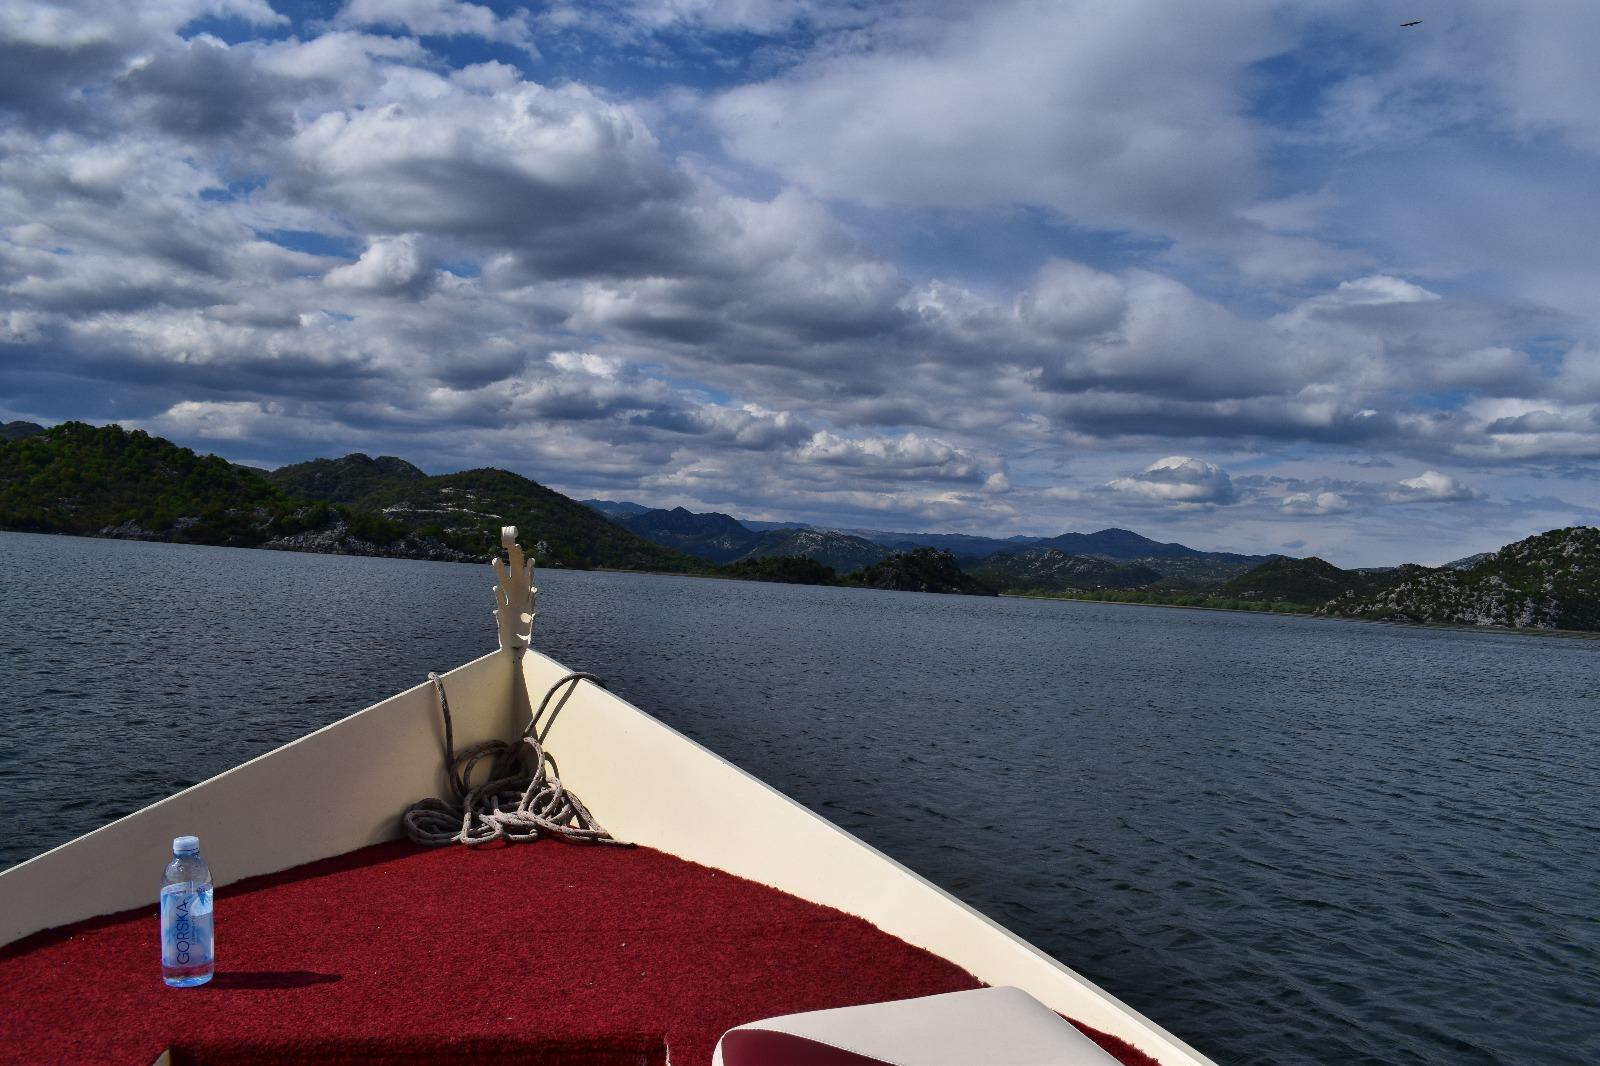 Lake Skadar – Boat Milica Tours (Excellent Family Run Boat Tours)